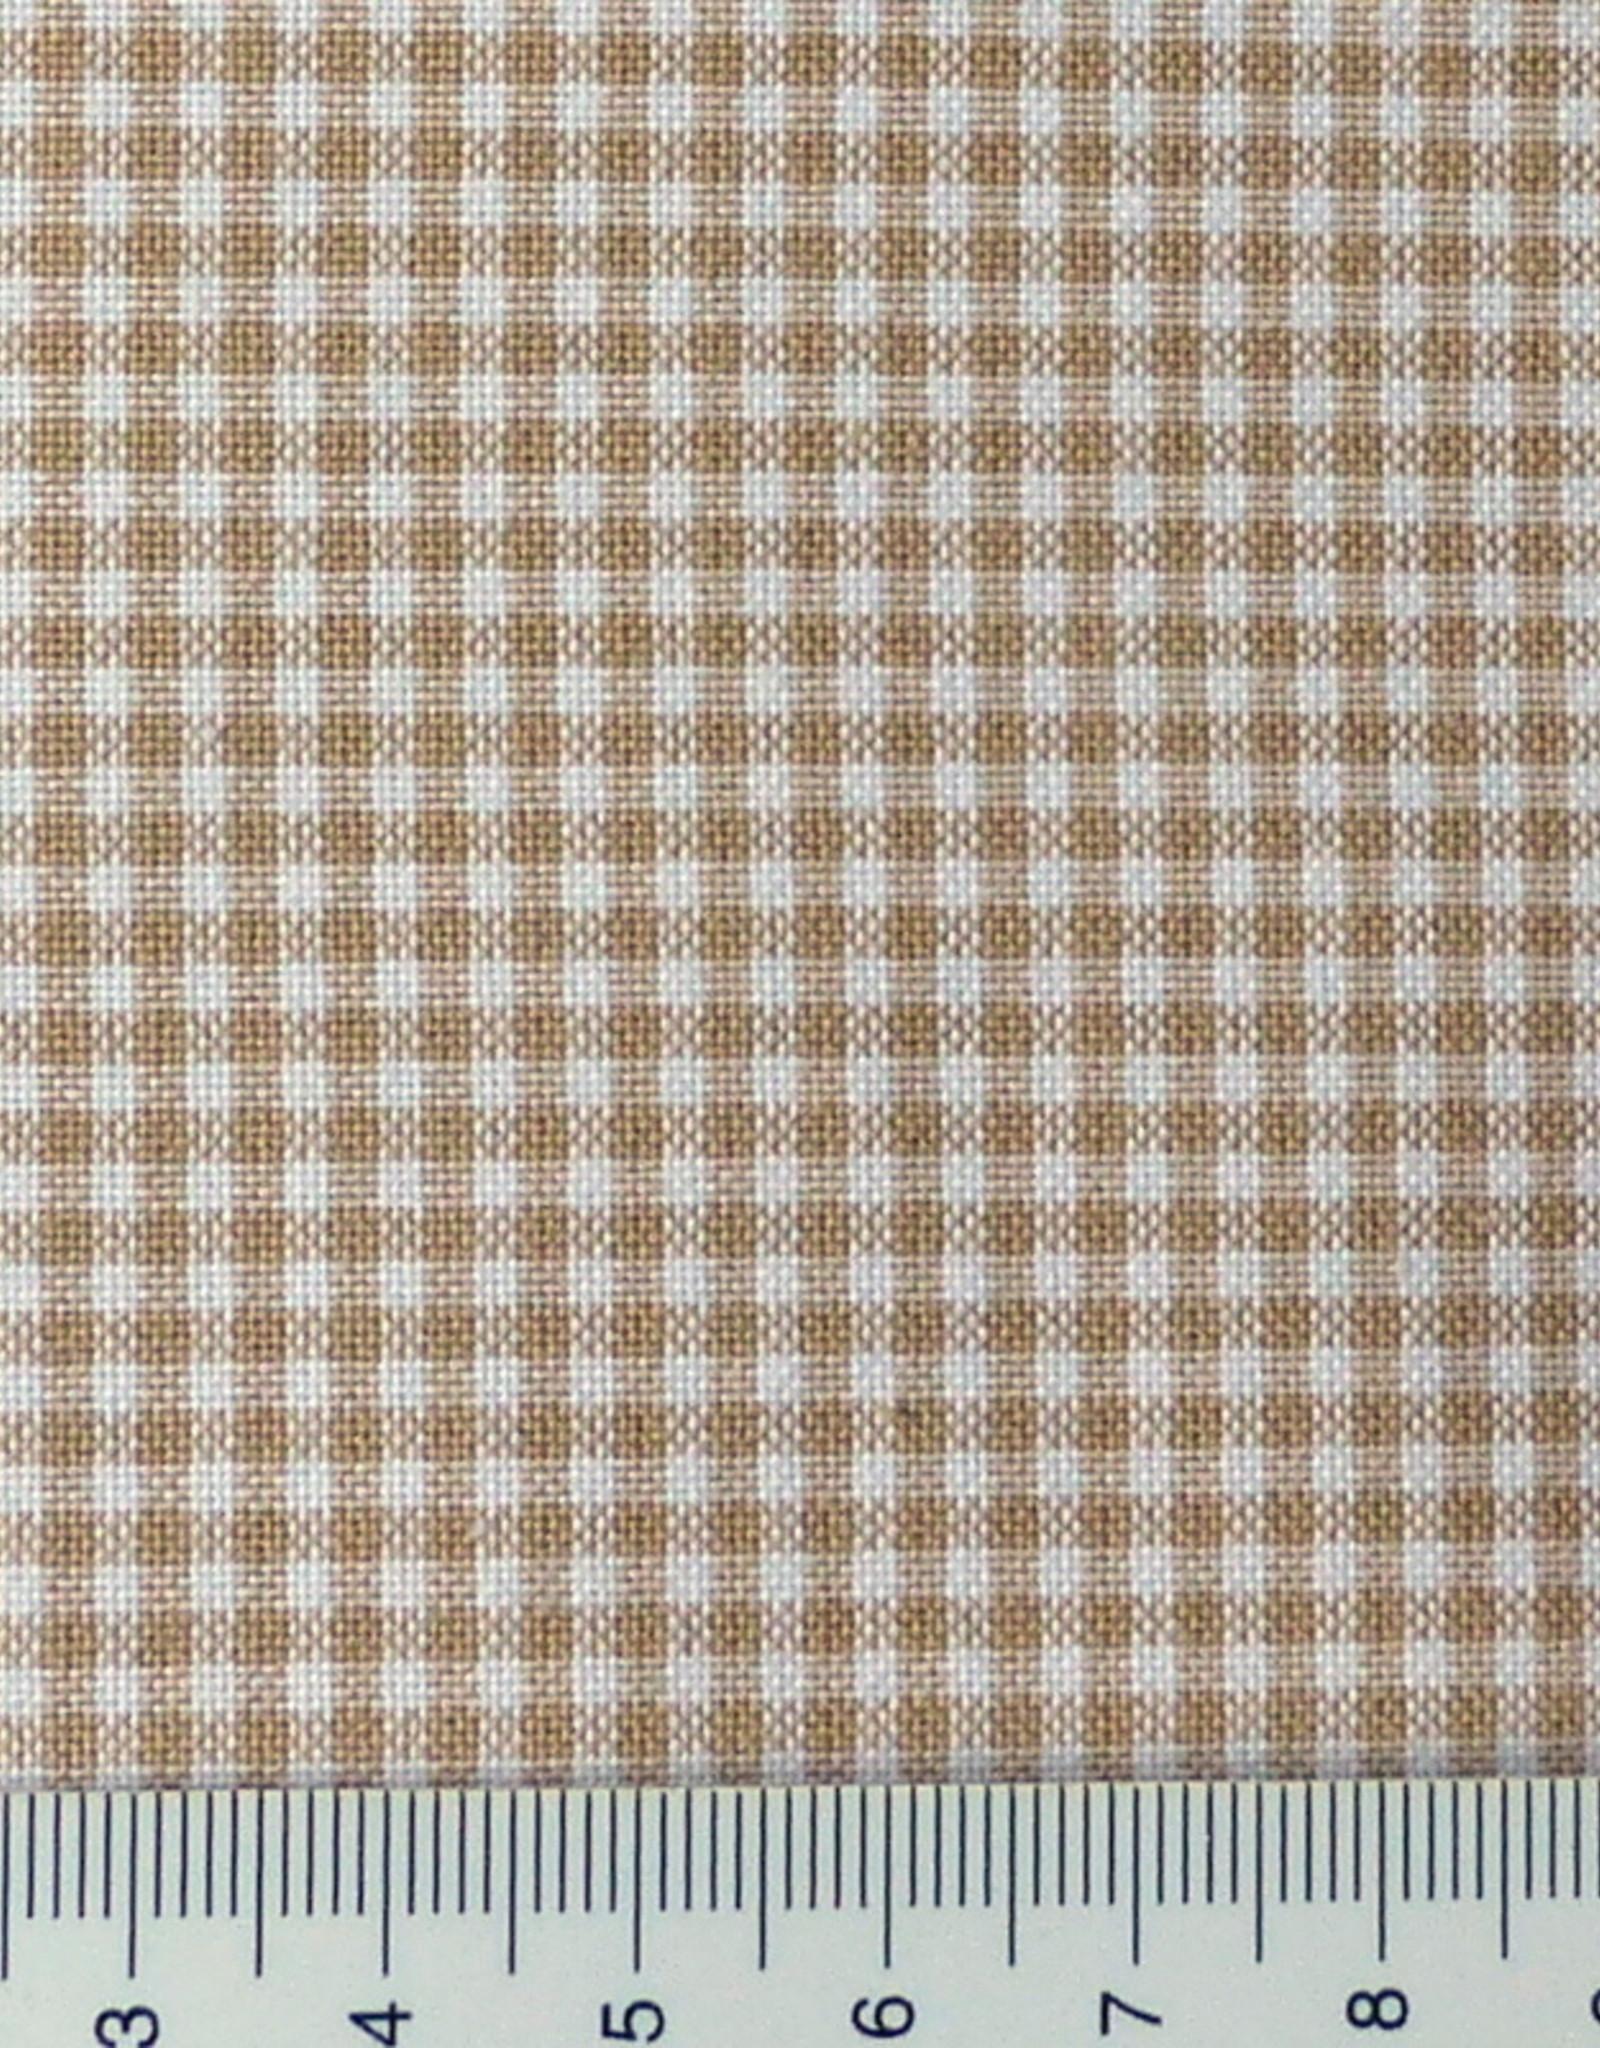 Westfalenstoffe AG 10 cm  Lyon W4008300